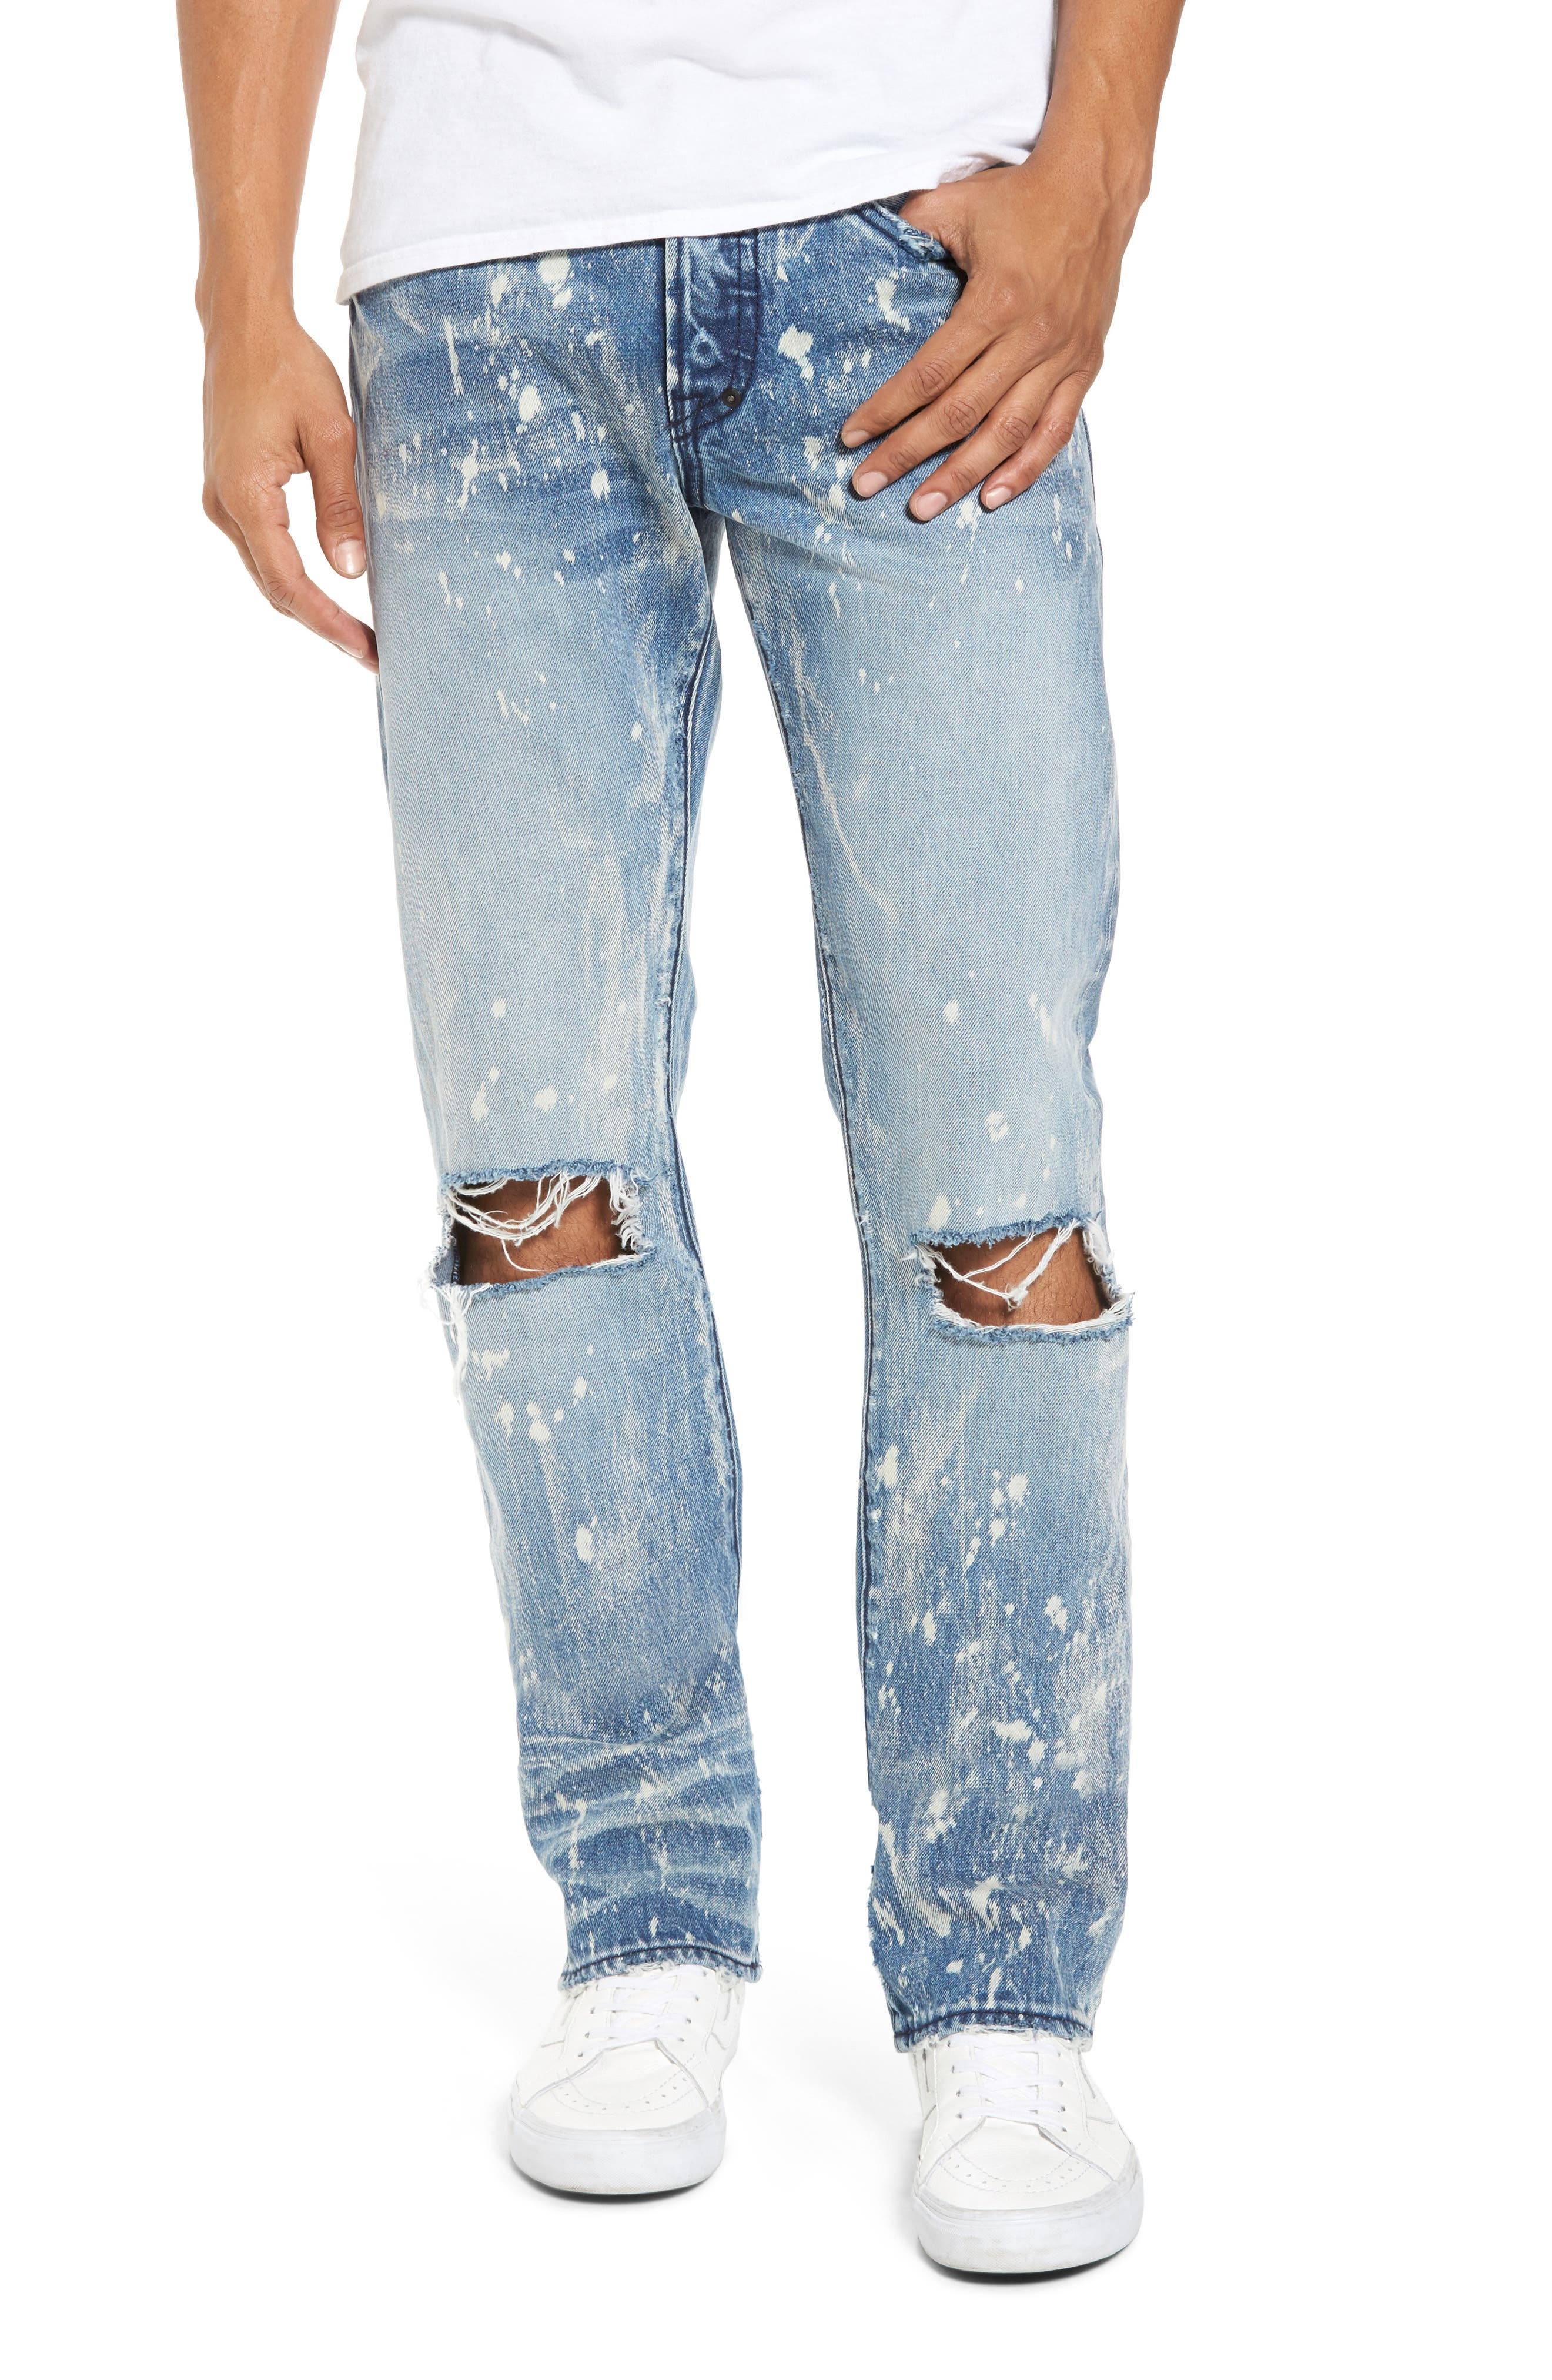 Demon Slim Straight Leg Jeans,                         Main,                         color, Indigoblue